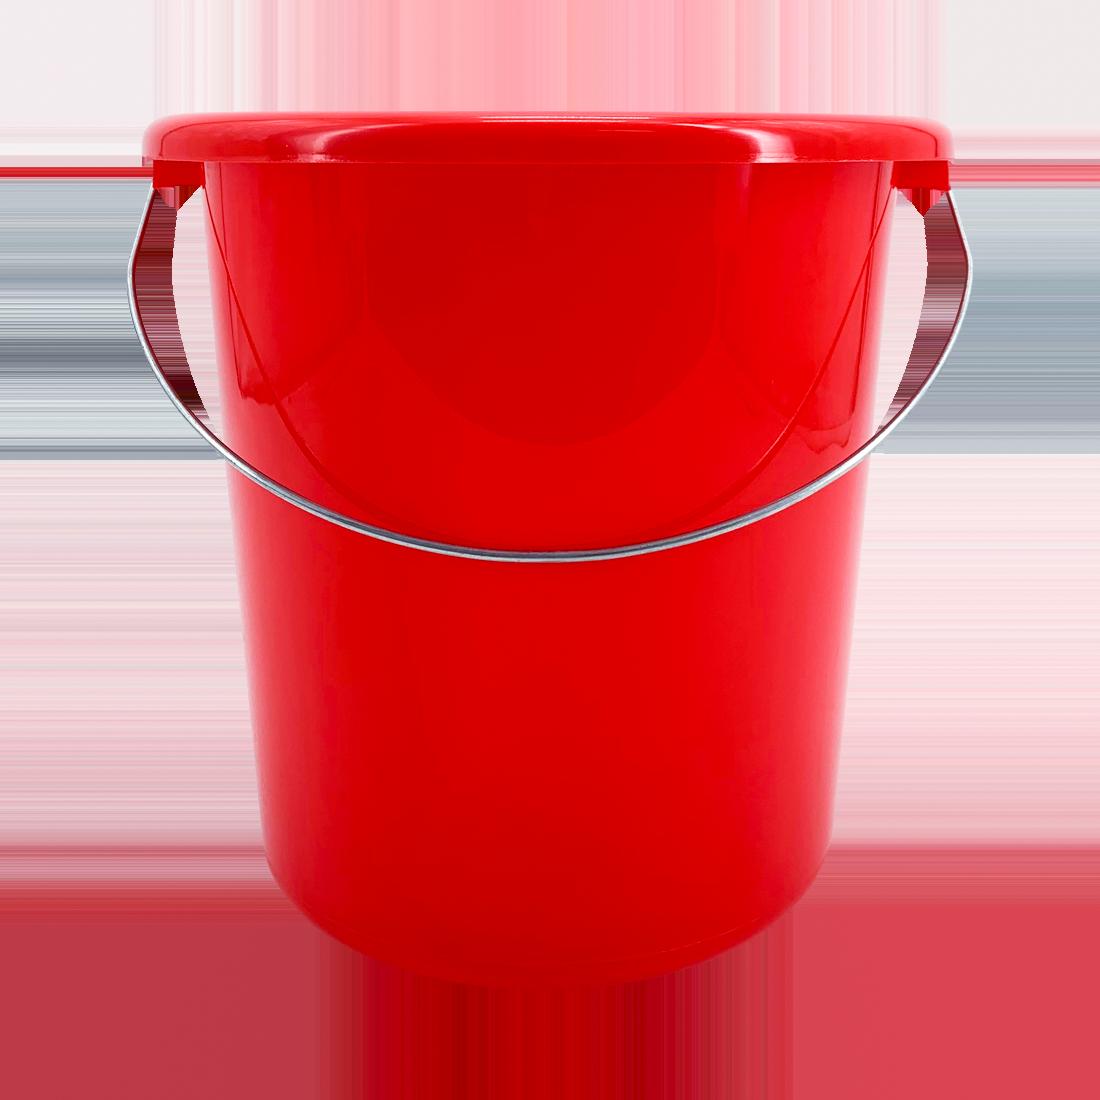 Eimer mit Metallbügel, Kunstoff, rot, 10 Liter